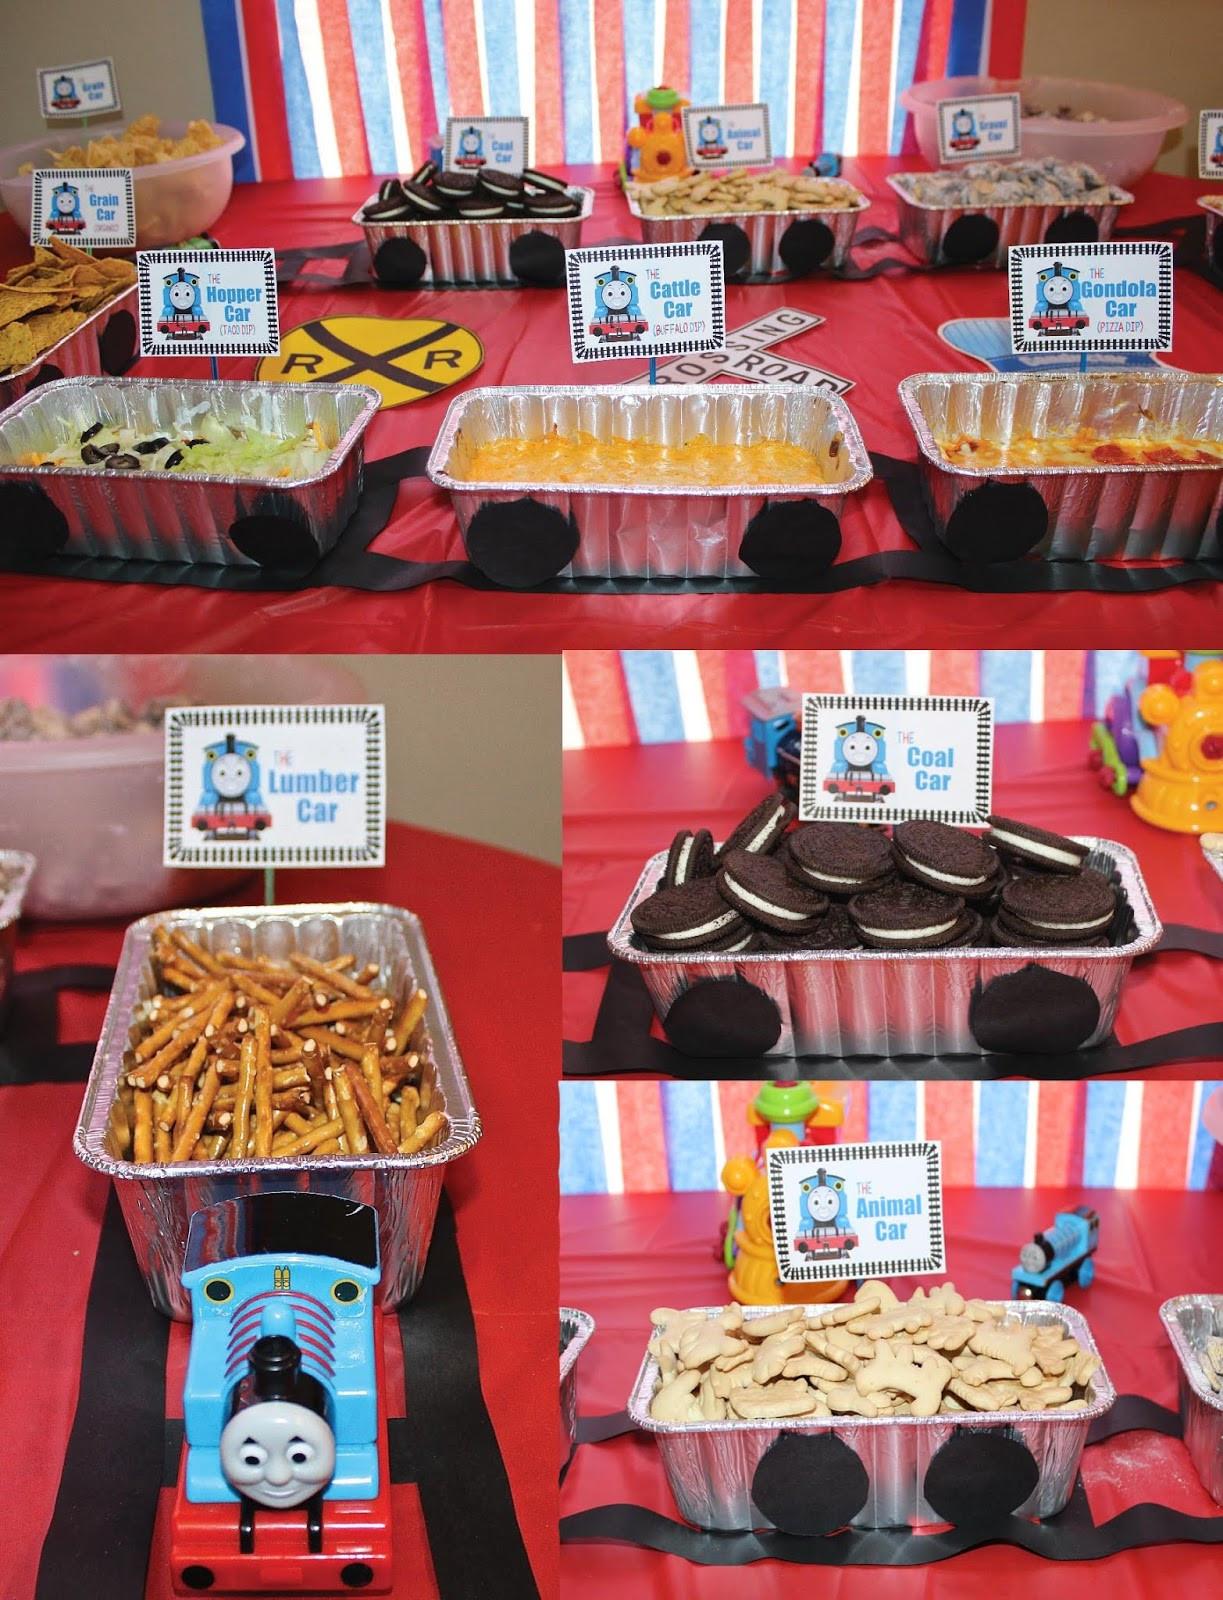 Train Birthday Party Decorations  Thomas the Train Birthday Party Chugga Chugga TWO TWO